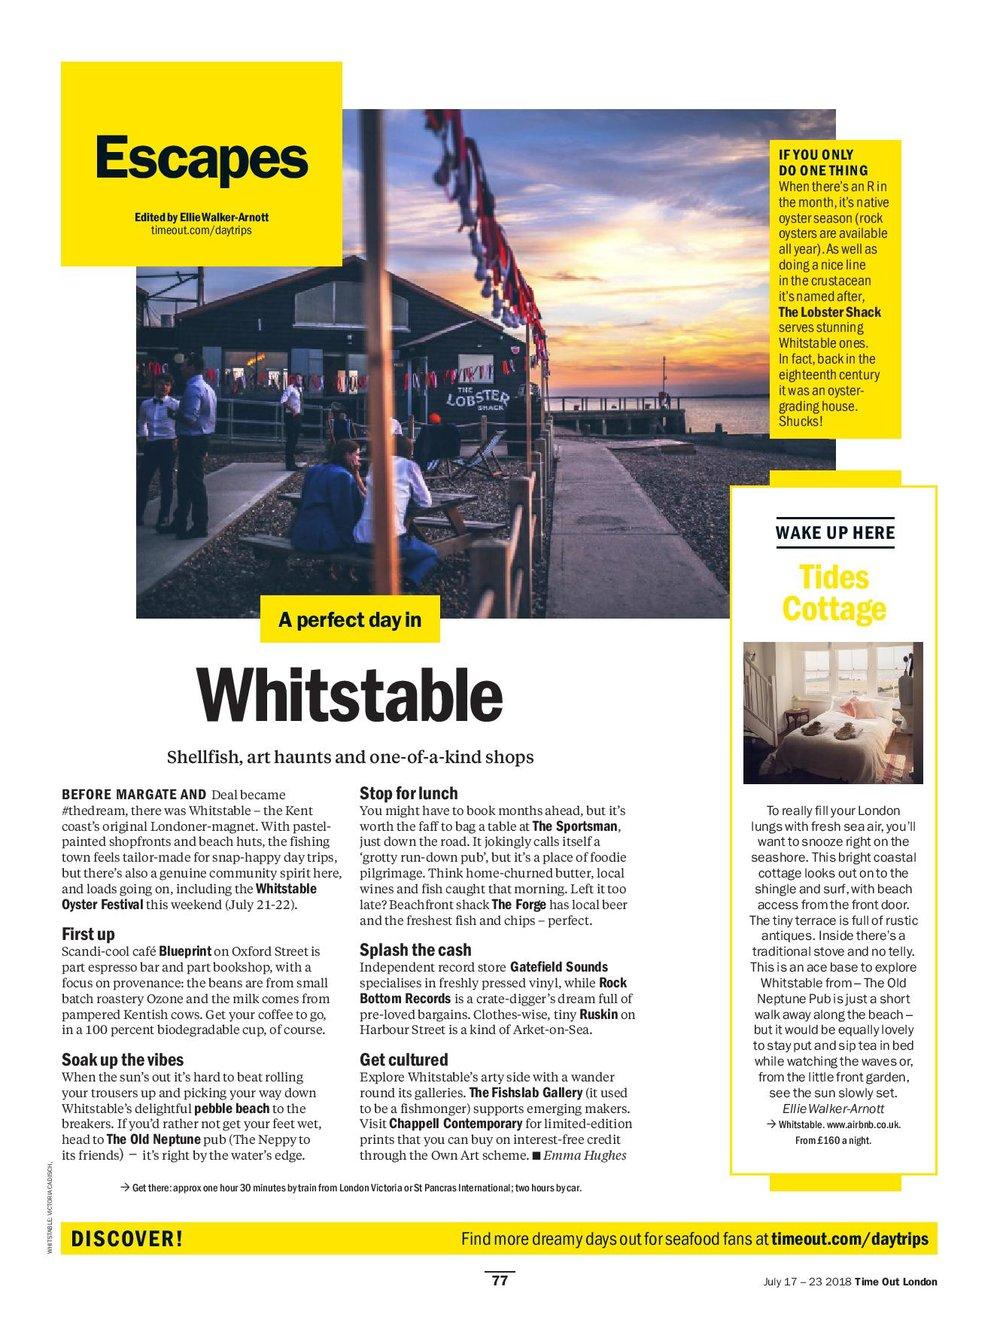 Escapes-page-001.jpg